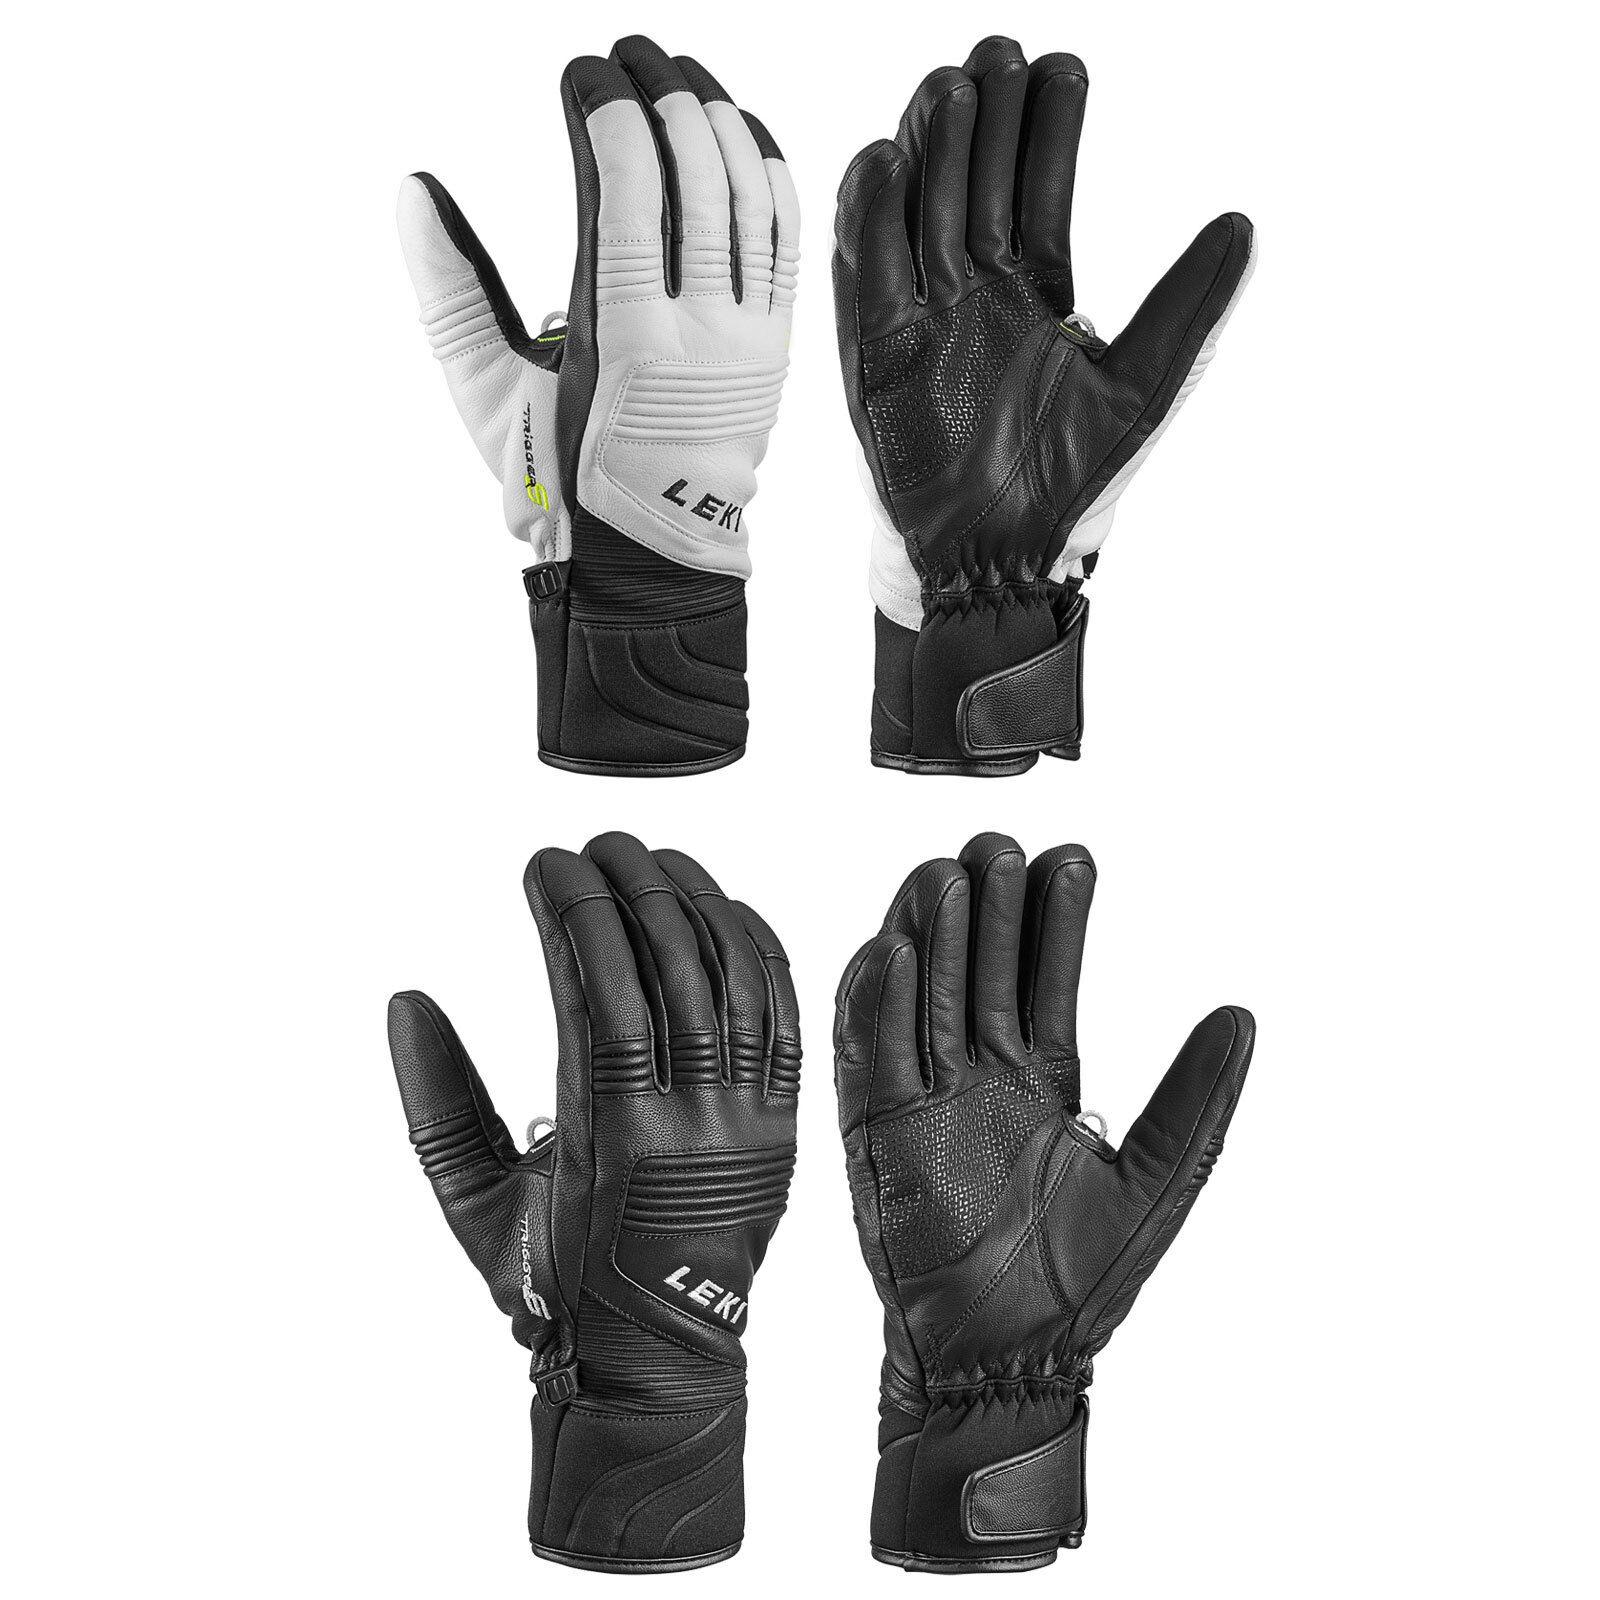 Leki Platinum S Herren-Skihandschuhe Handschuhe Wintersport NEU